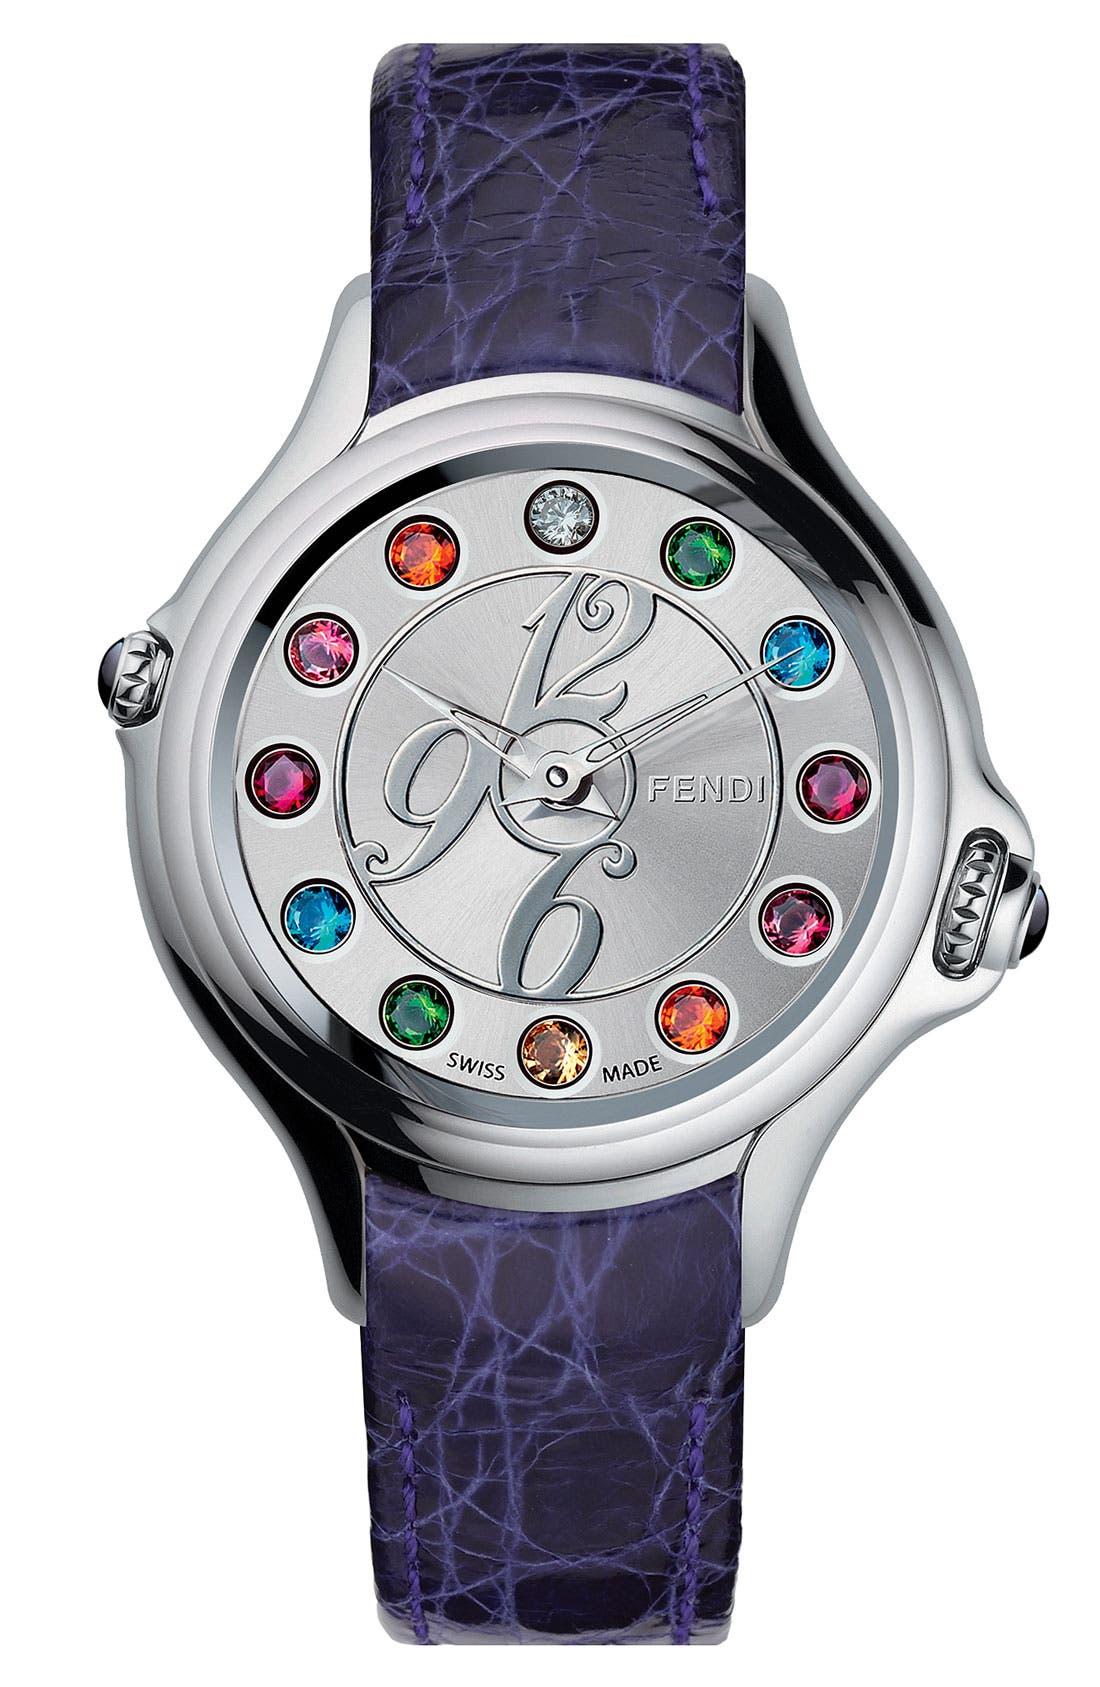 Main Image - Fendi 'Crazy Carats' Teju Lizardskin Strap Watch, 38mm